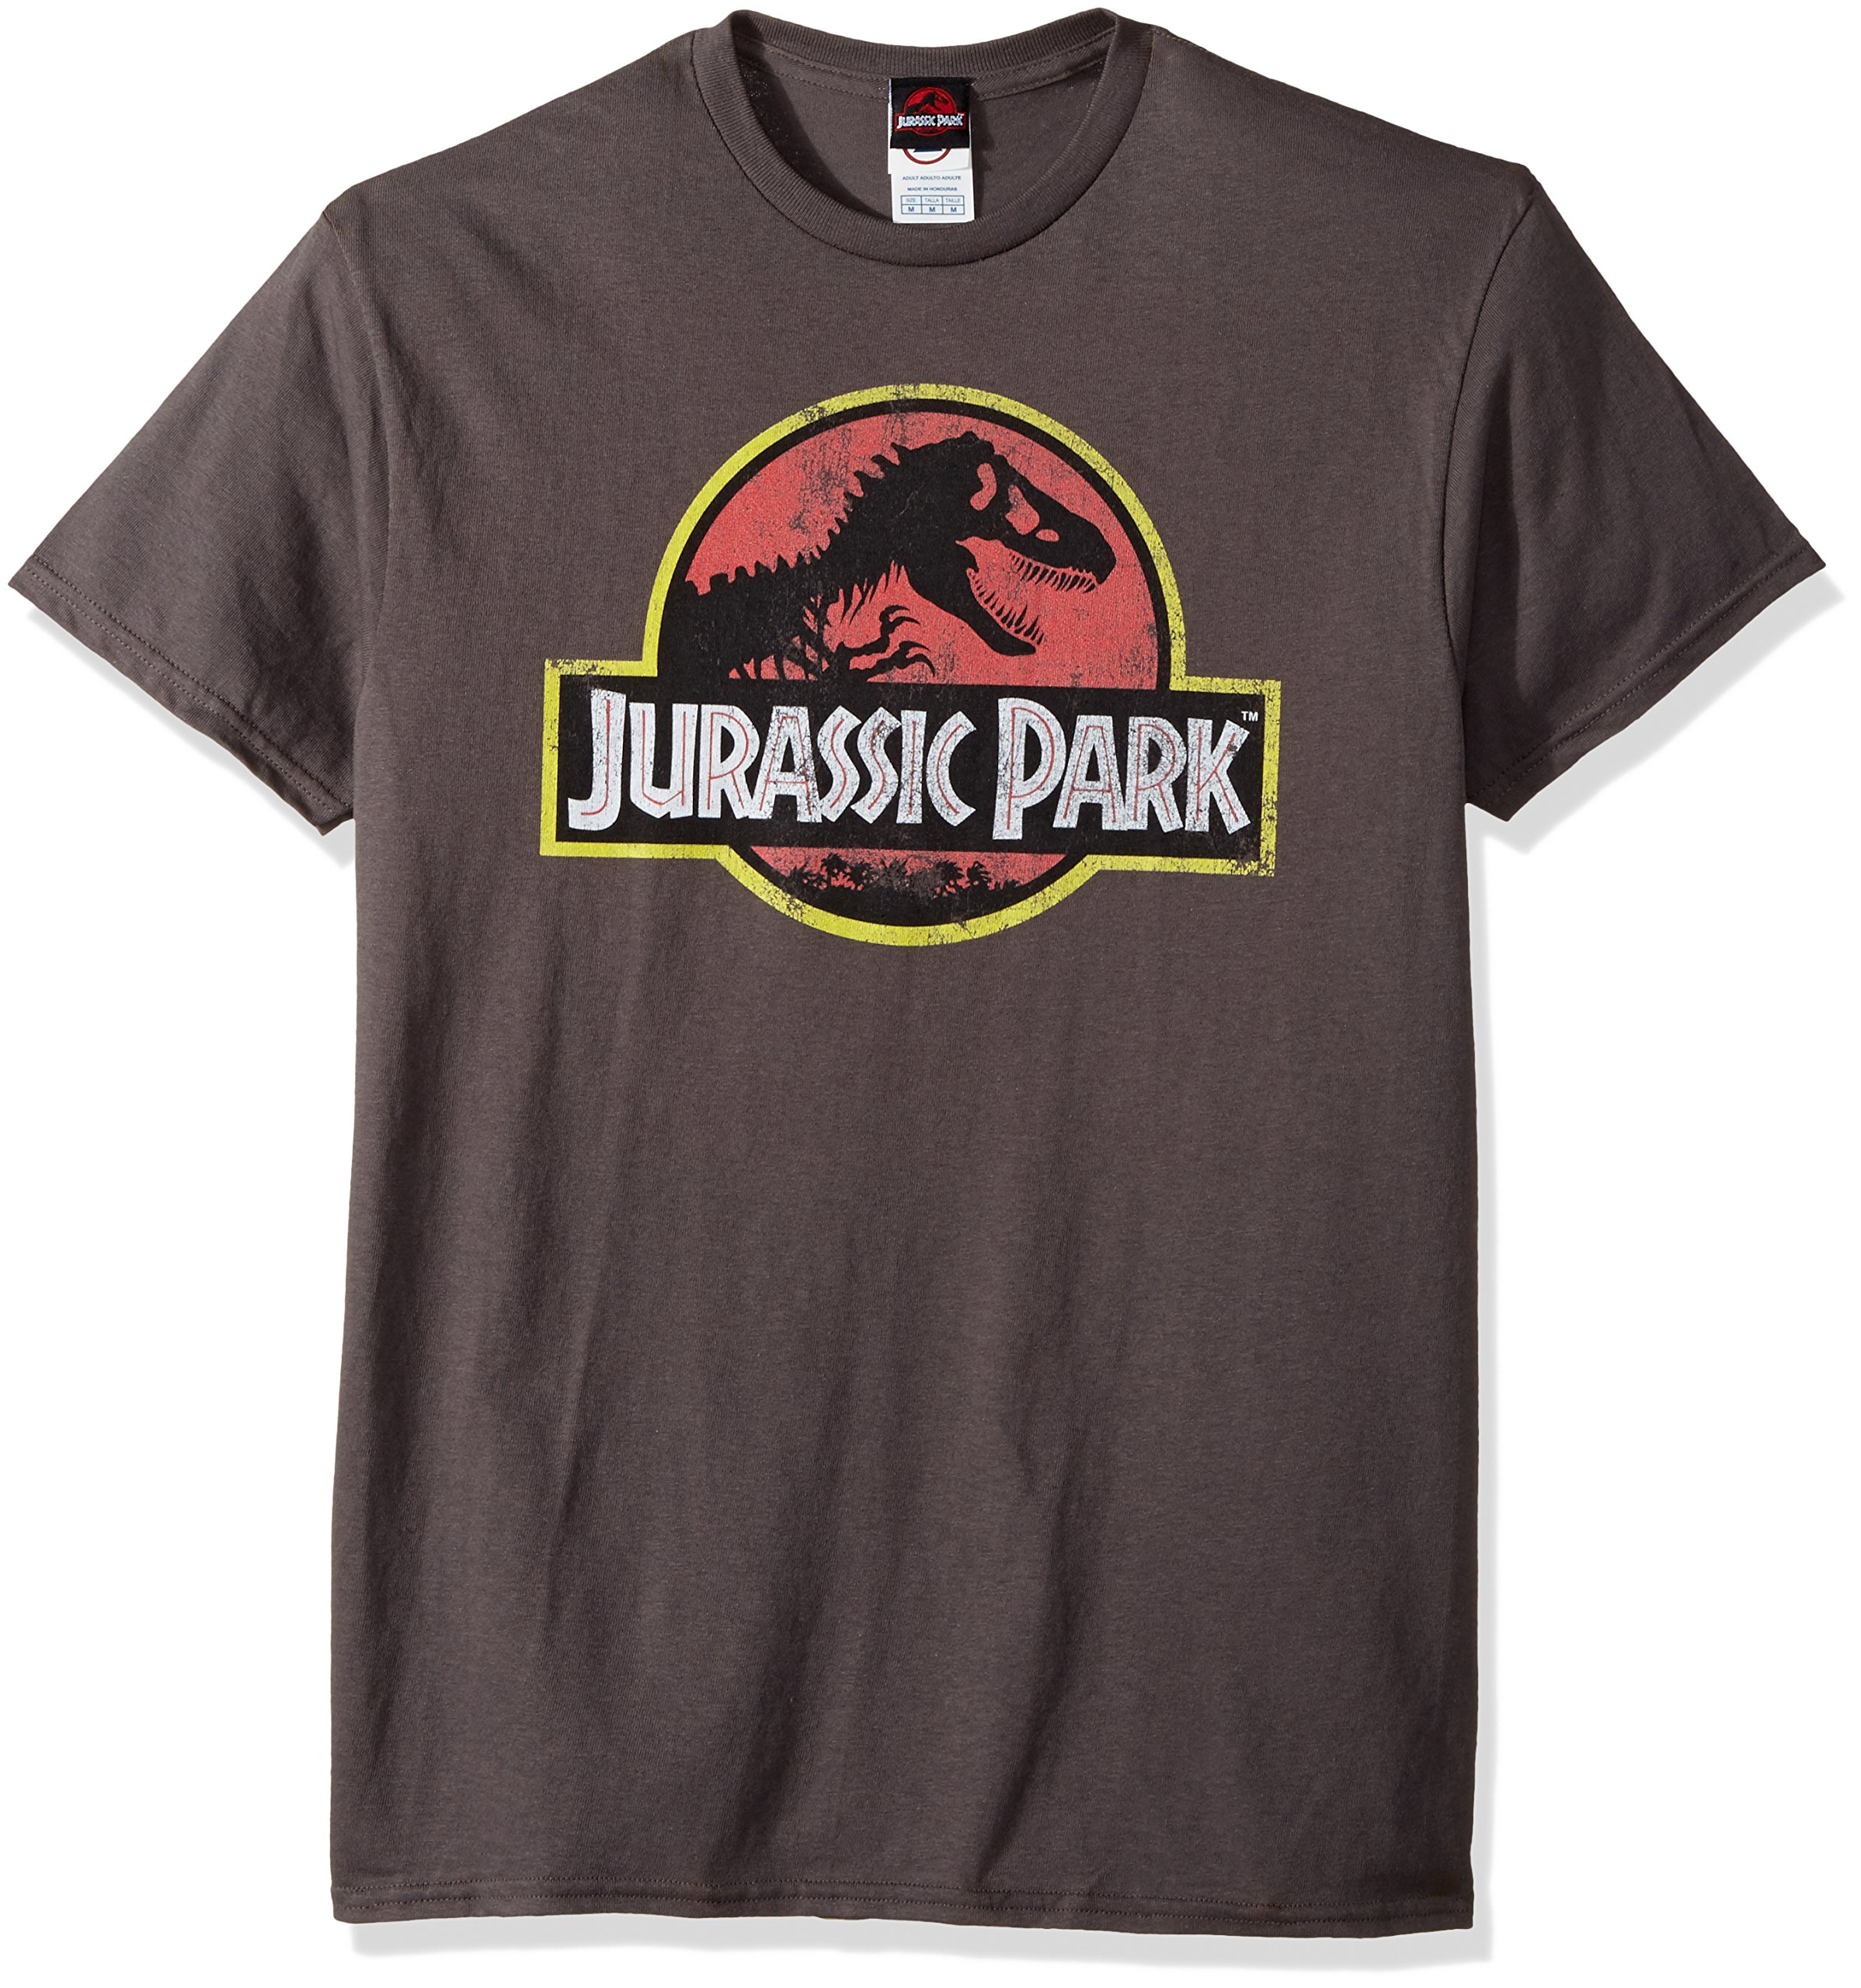 Jurassic Park Men's Movie Logo T-Shirt, Charcoal, Large